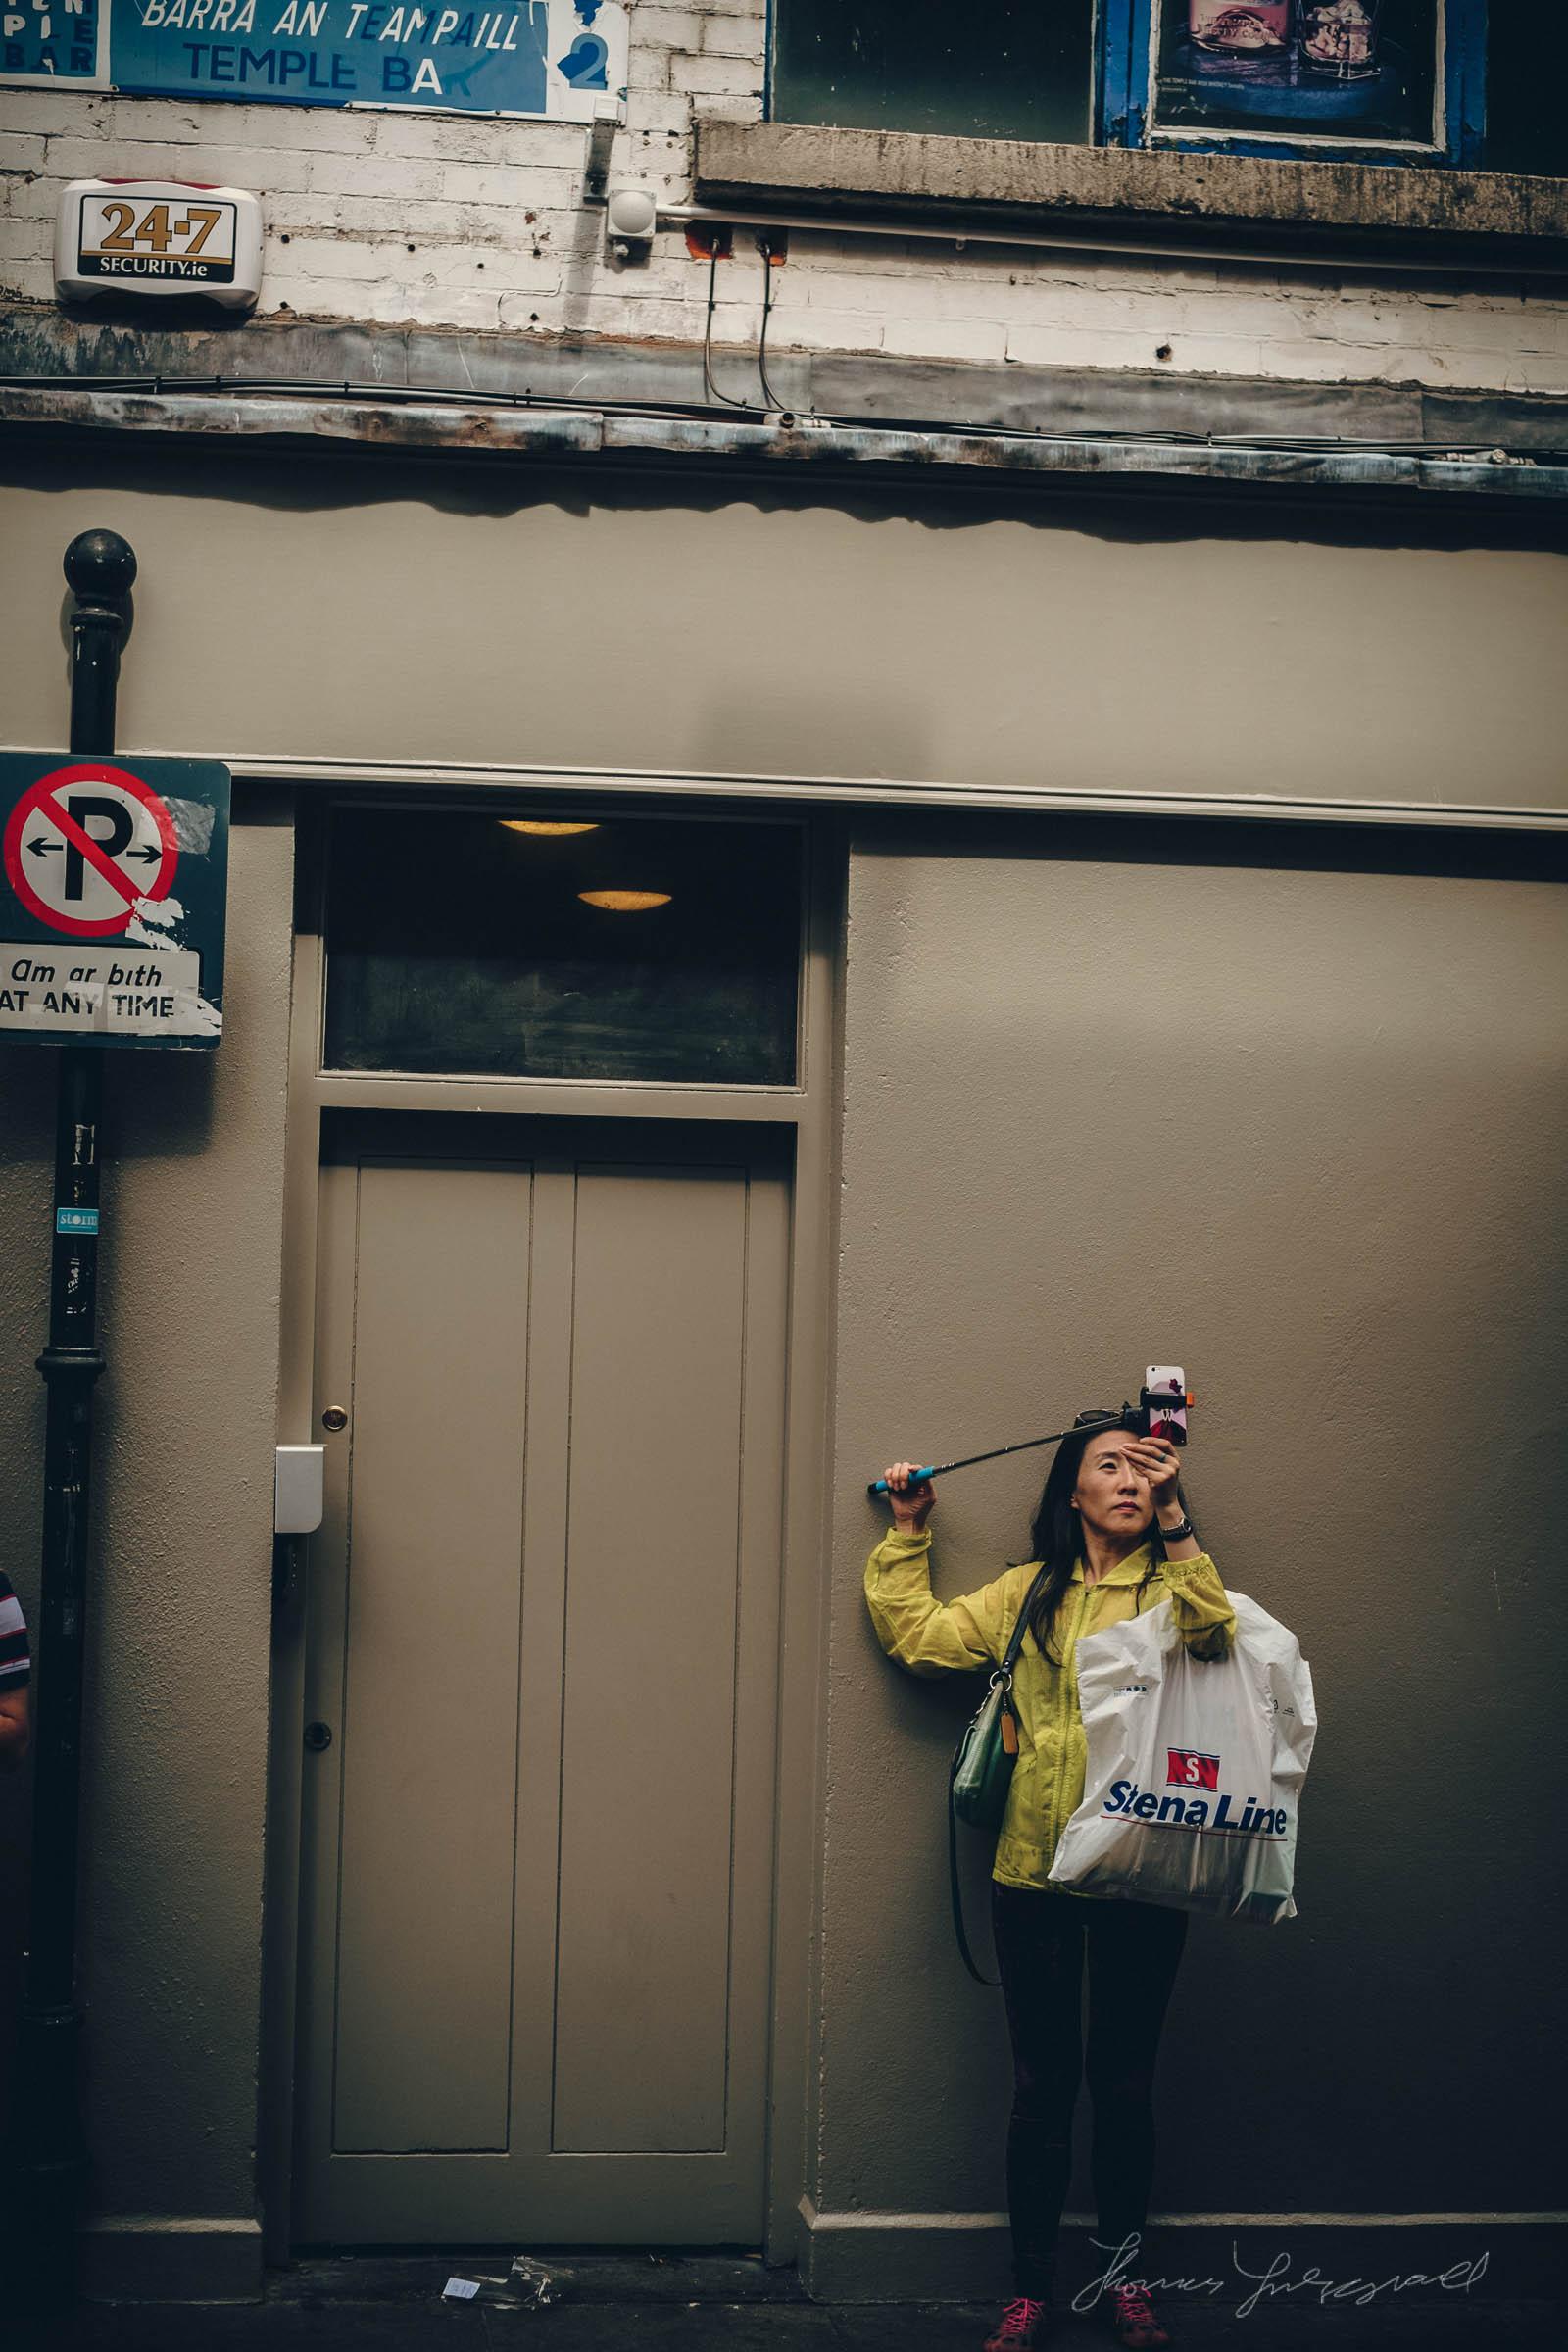 Tourist Taking a Selfie in Dublin's Temple Bar - Fuji X-E1 XF35mm f1.4